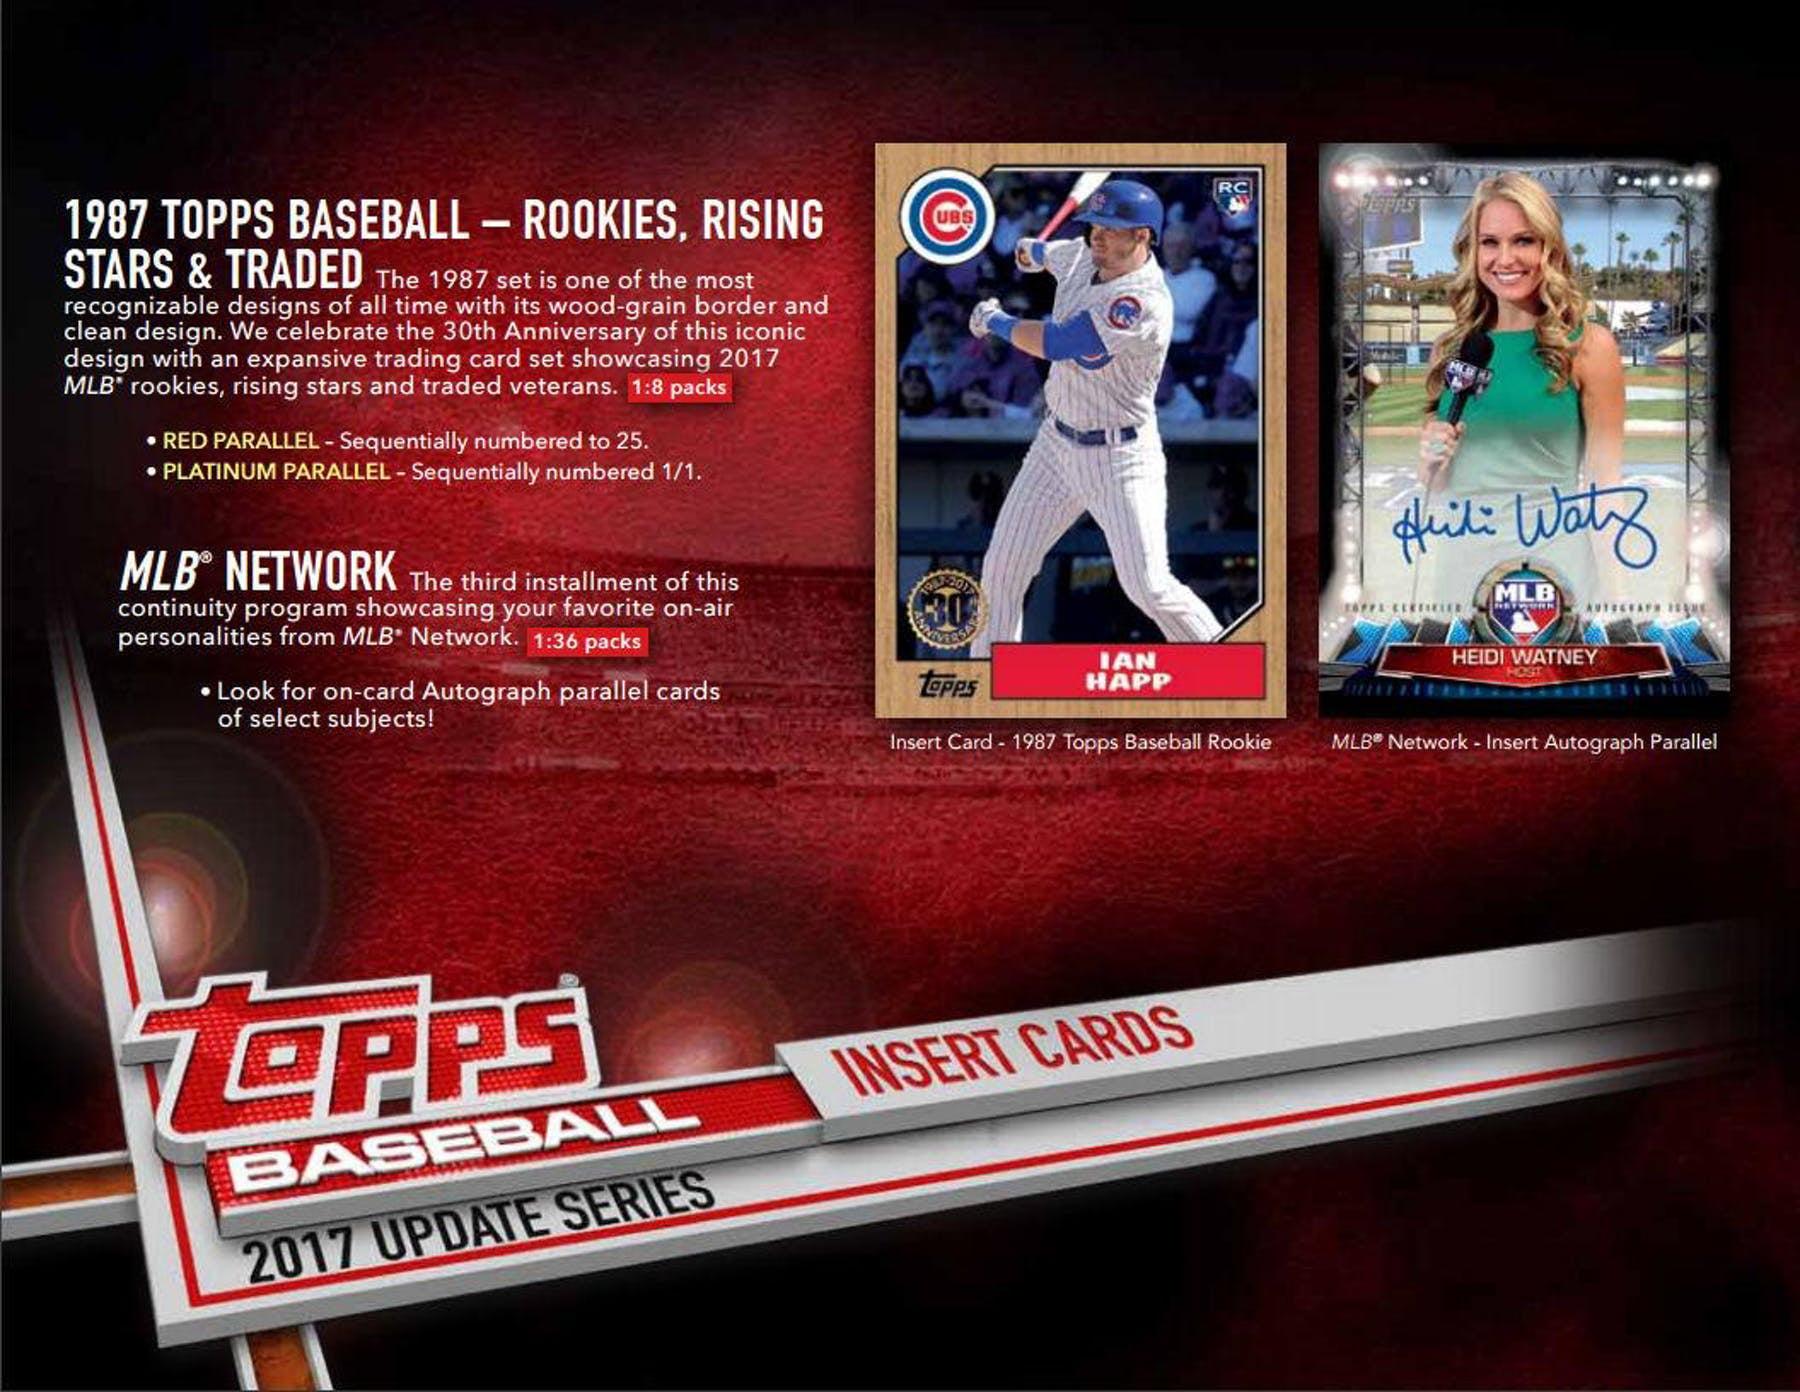 2017 Topps Baseball Update Series Booster Box